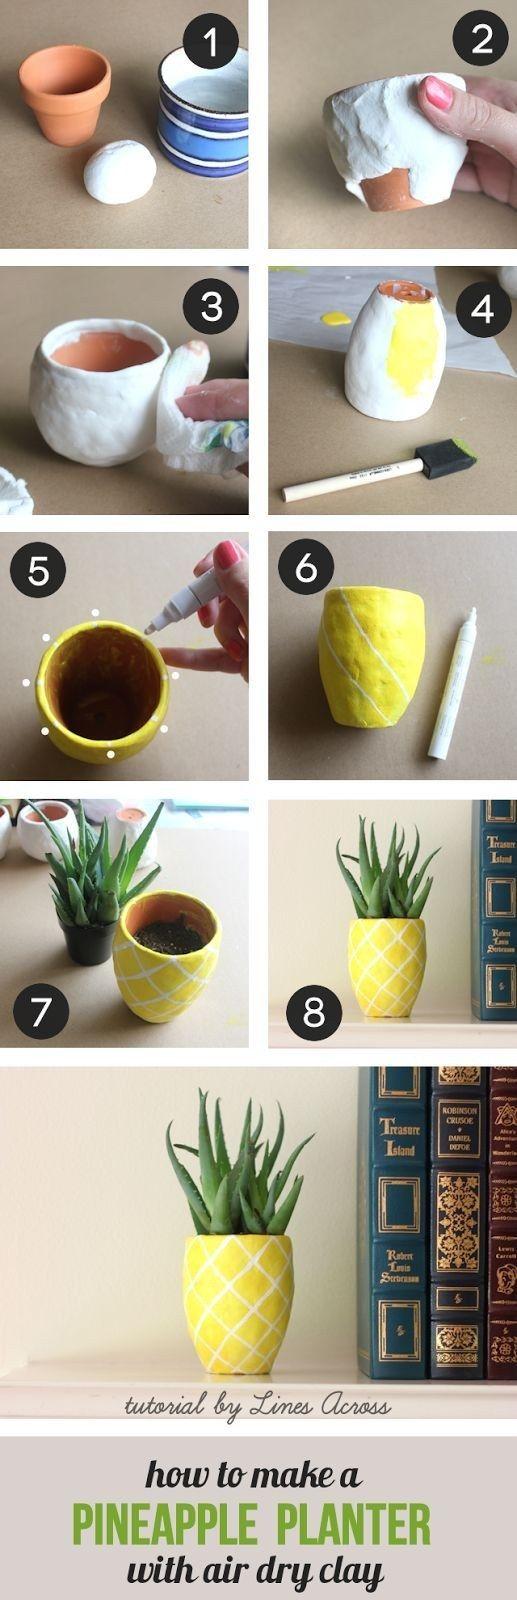 DIY Cute Succulent Pineapple Planter